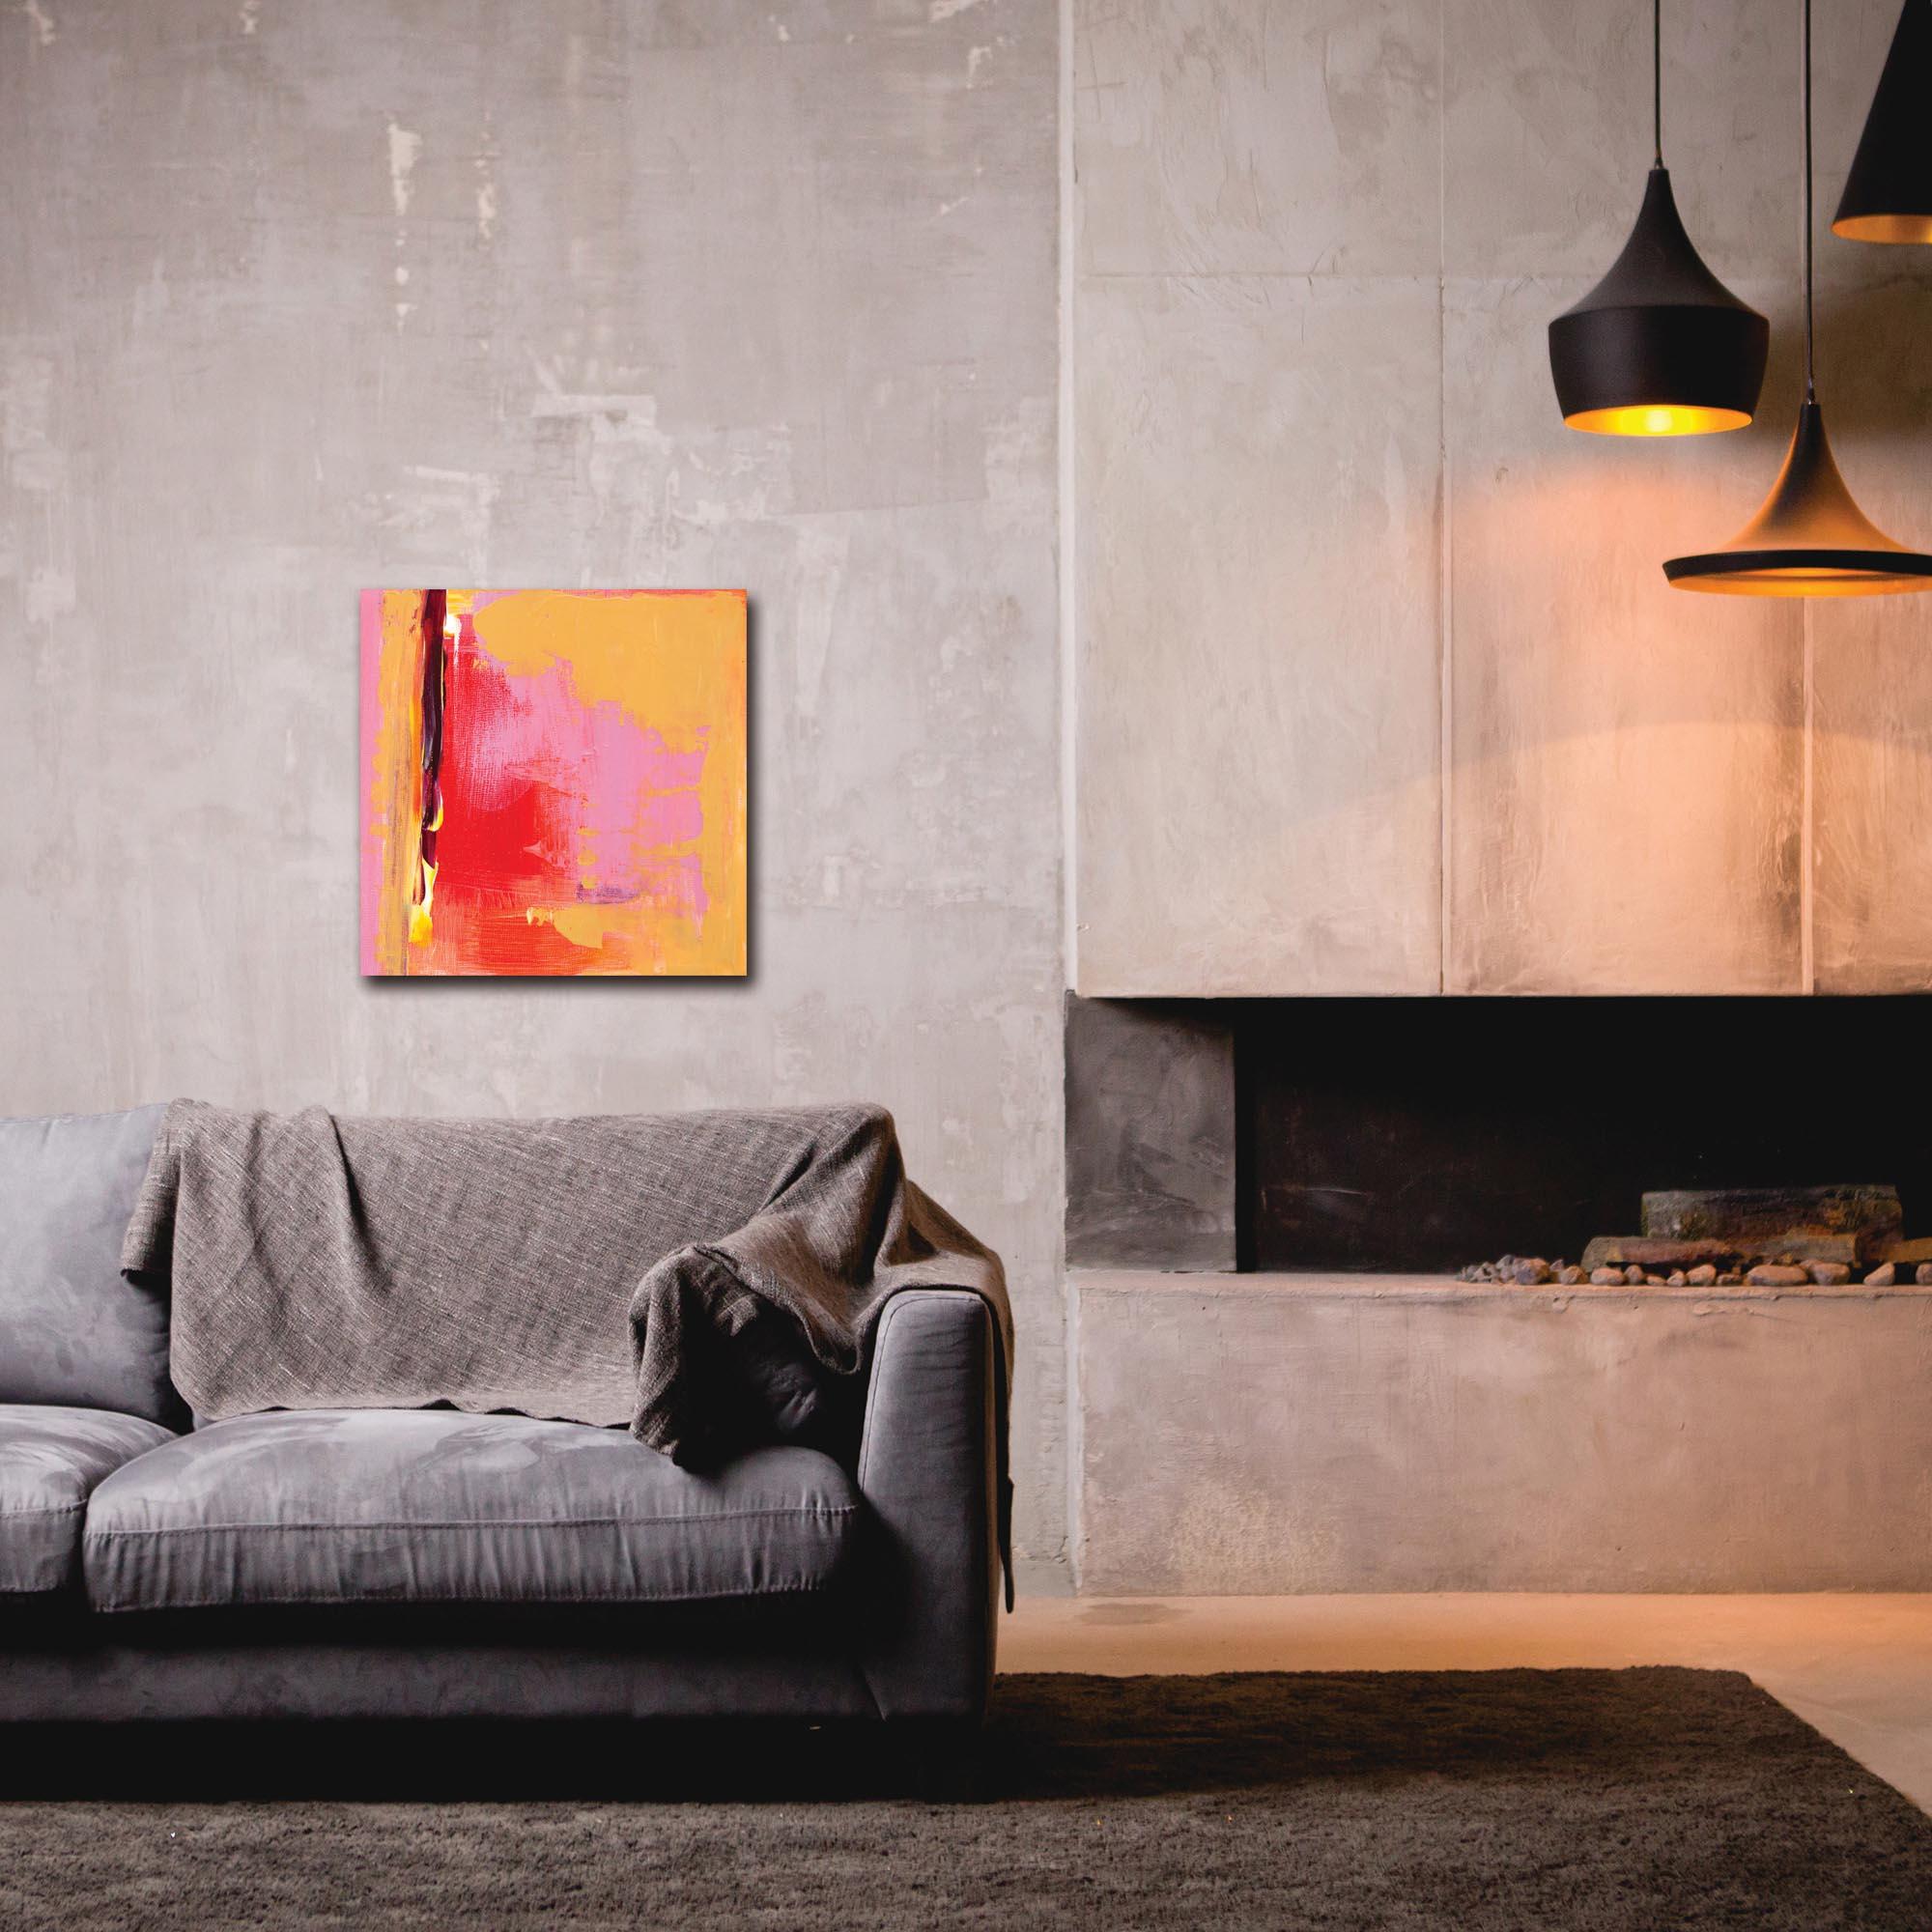 Abstract Wall Art 'Urban Life 6' - Urban Decor on Metal or Plexiglass - Lifestyle View